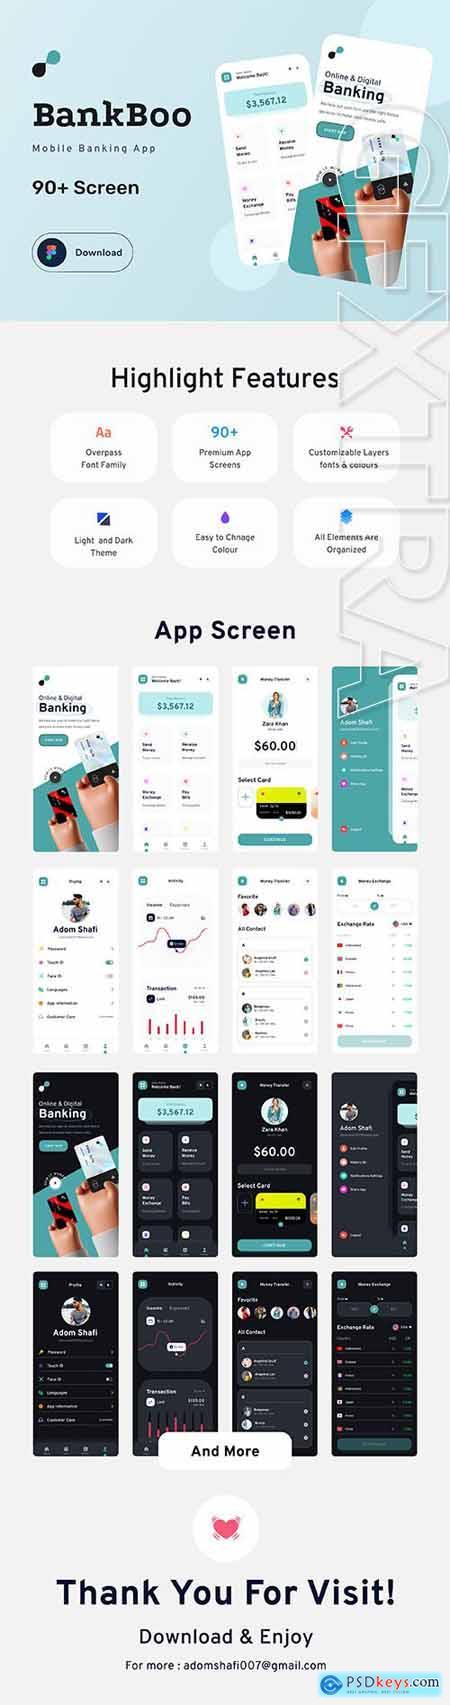 Bankboo Mobile Banding App Kit